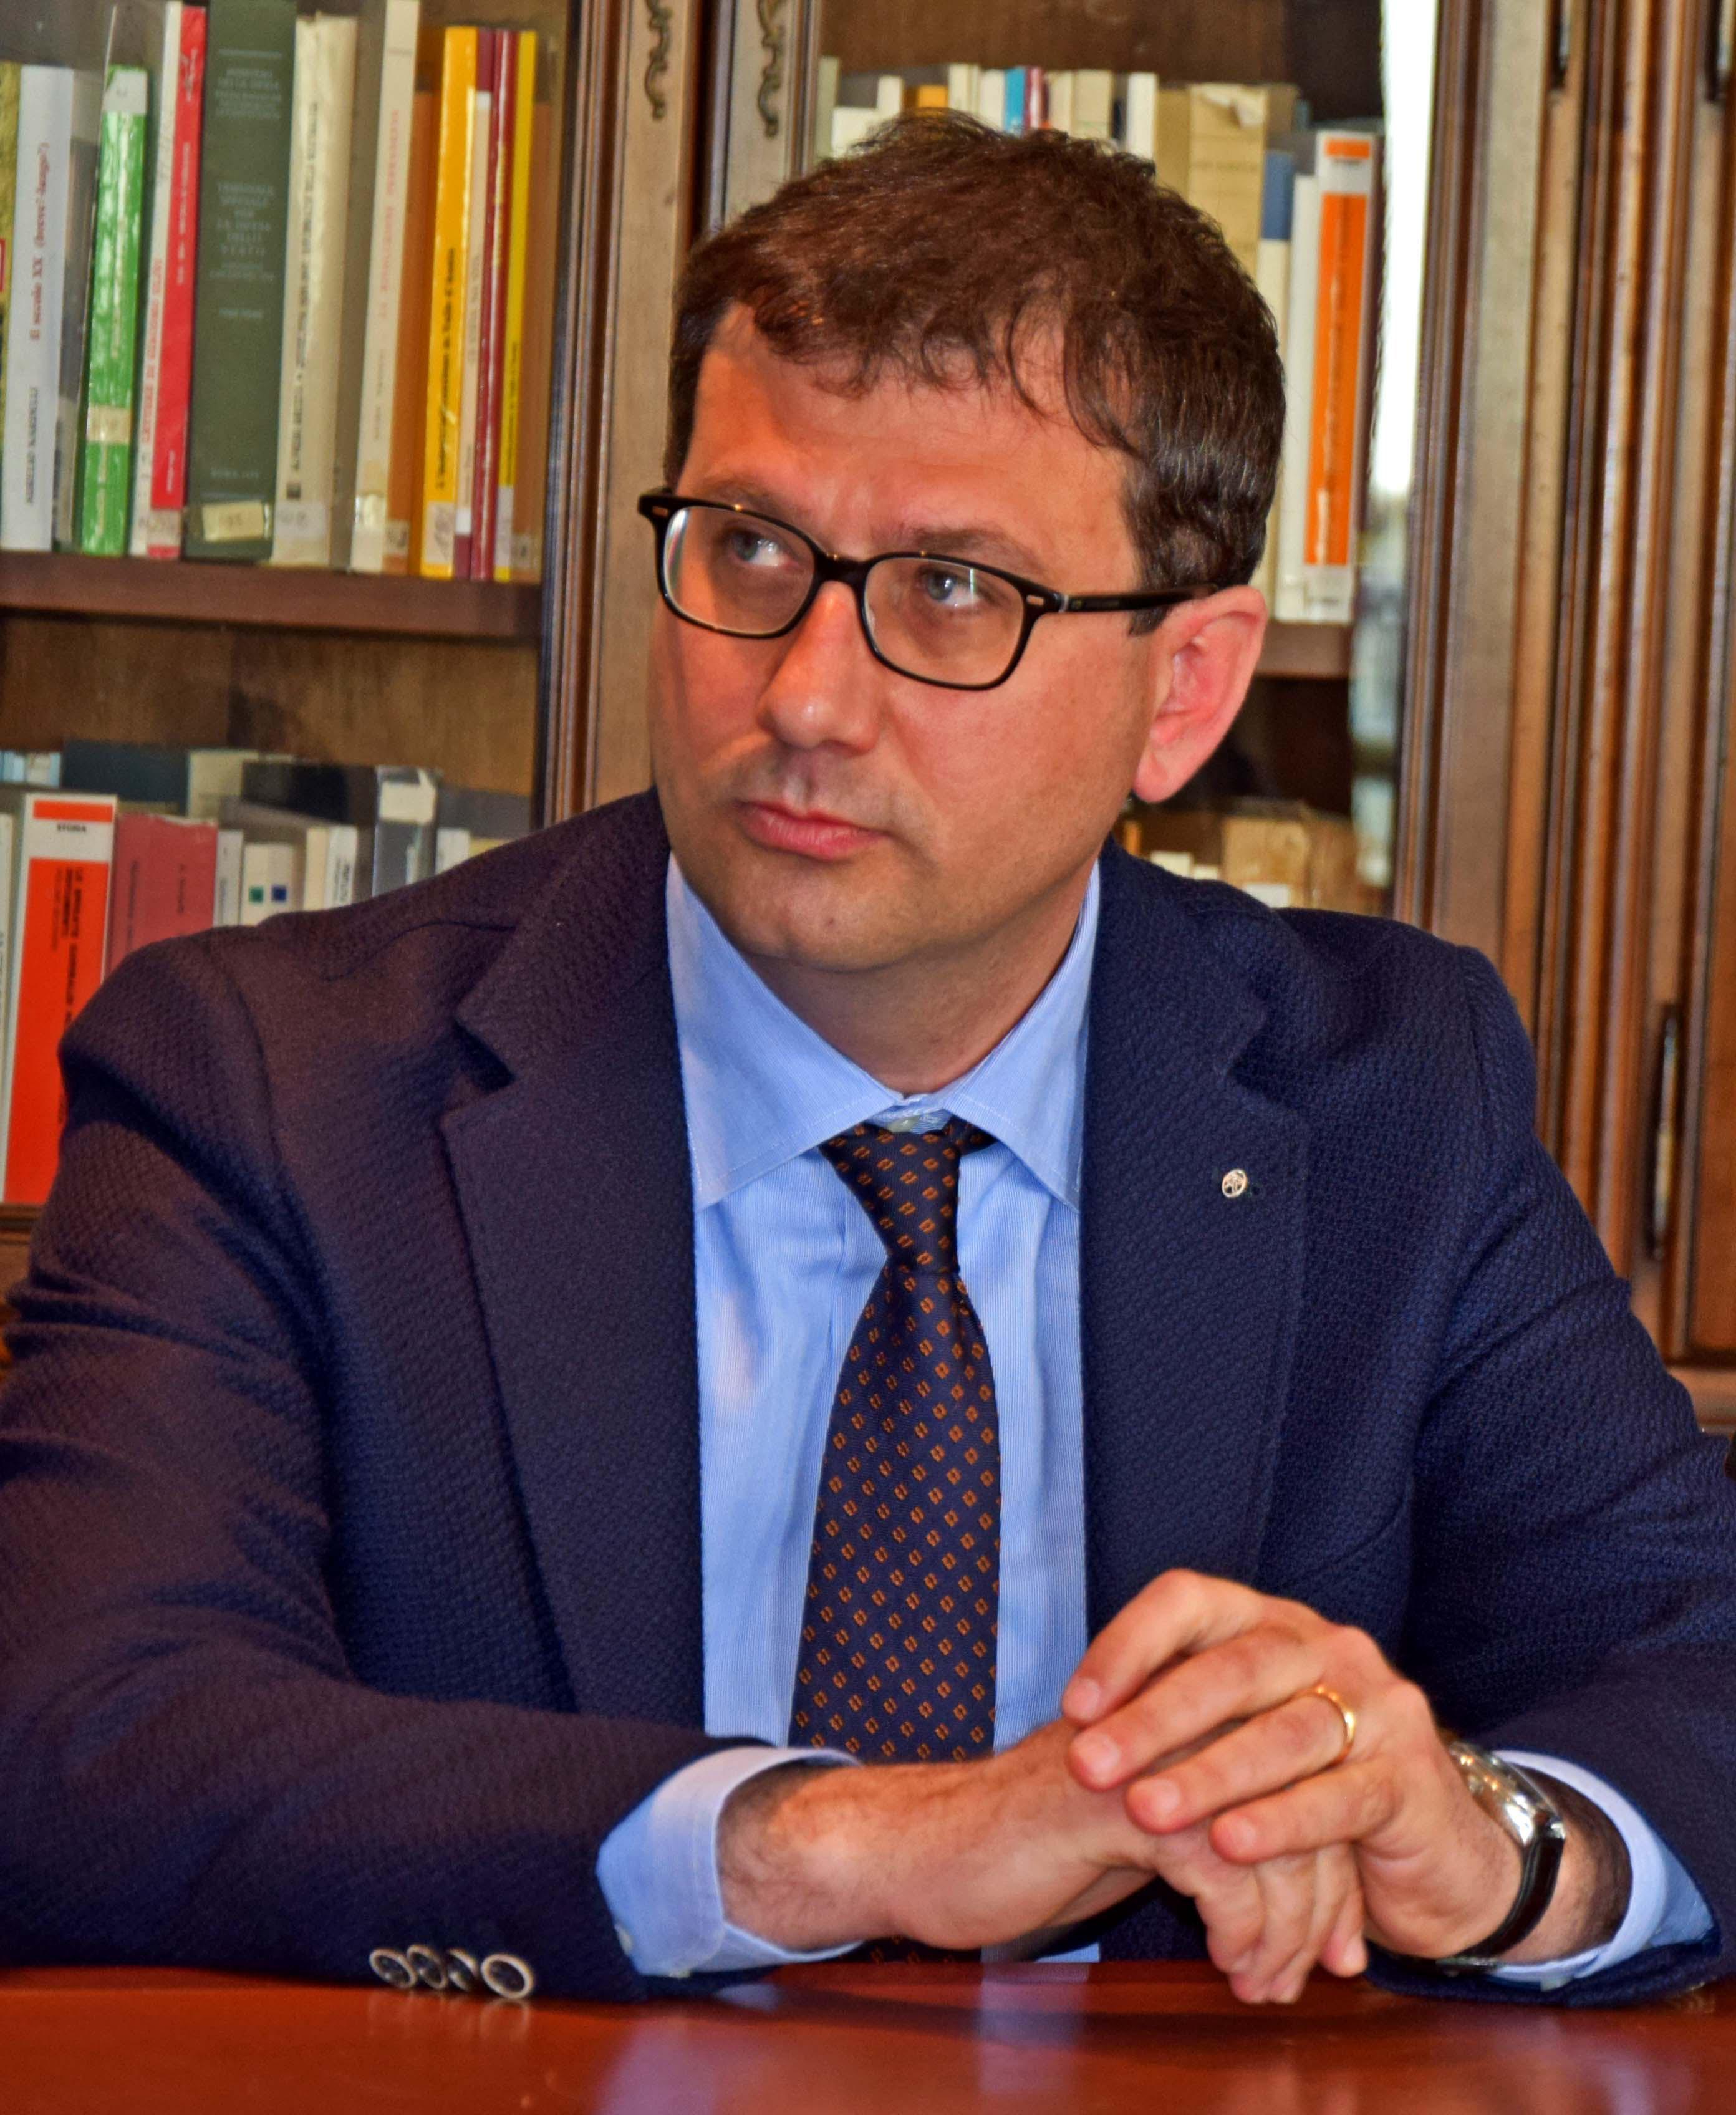 Maurizio Di Nicola